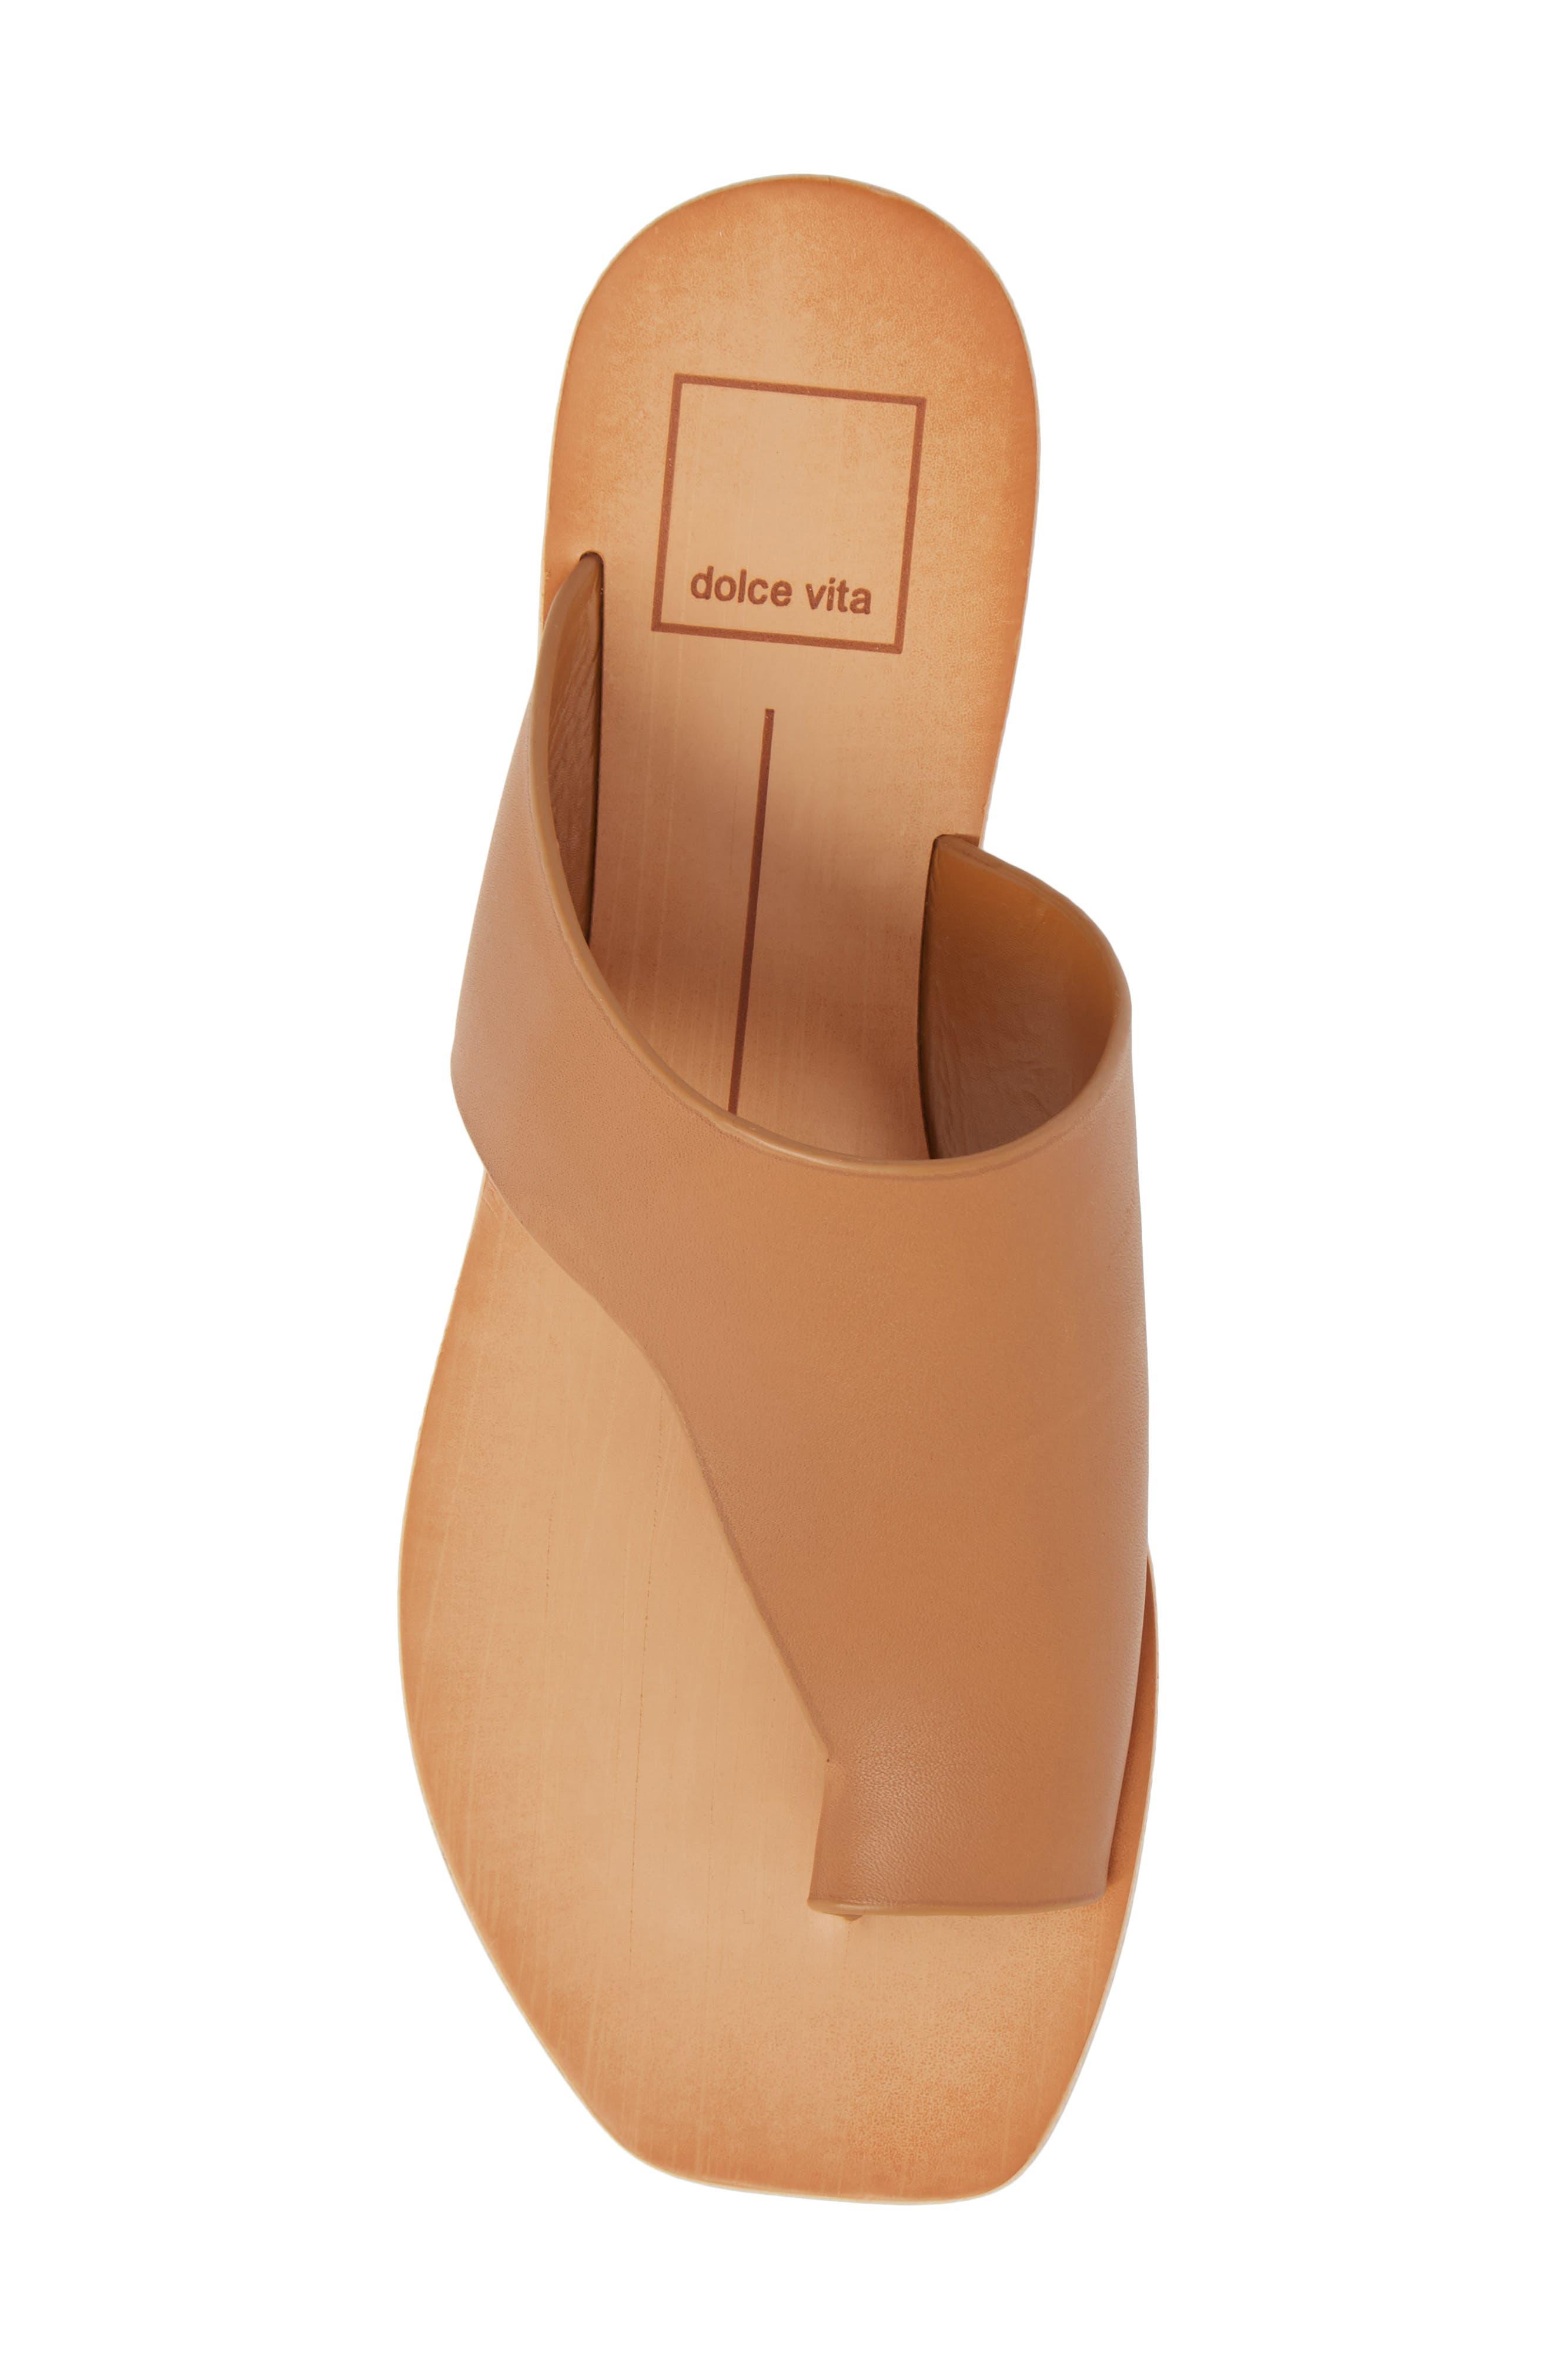 Hazle Asymmetrical Toe Loop Sandal,                             Alternate thumbnail 5, color,                             Caramel